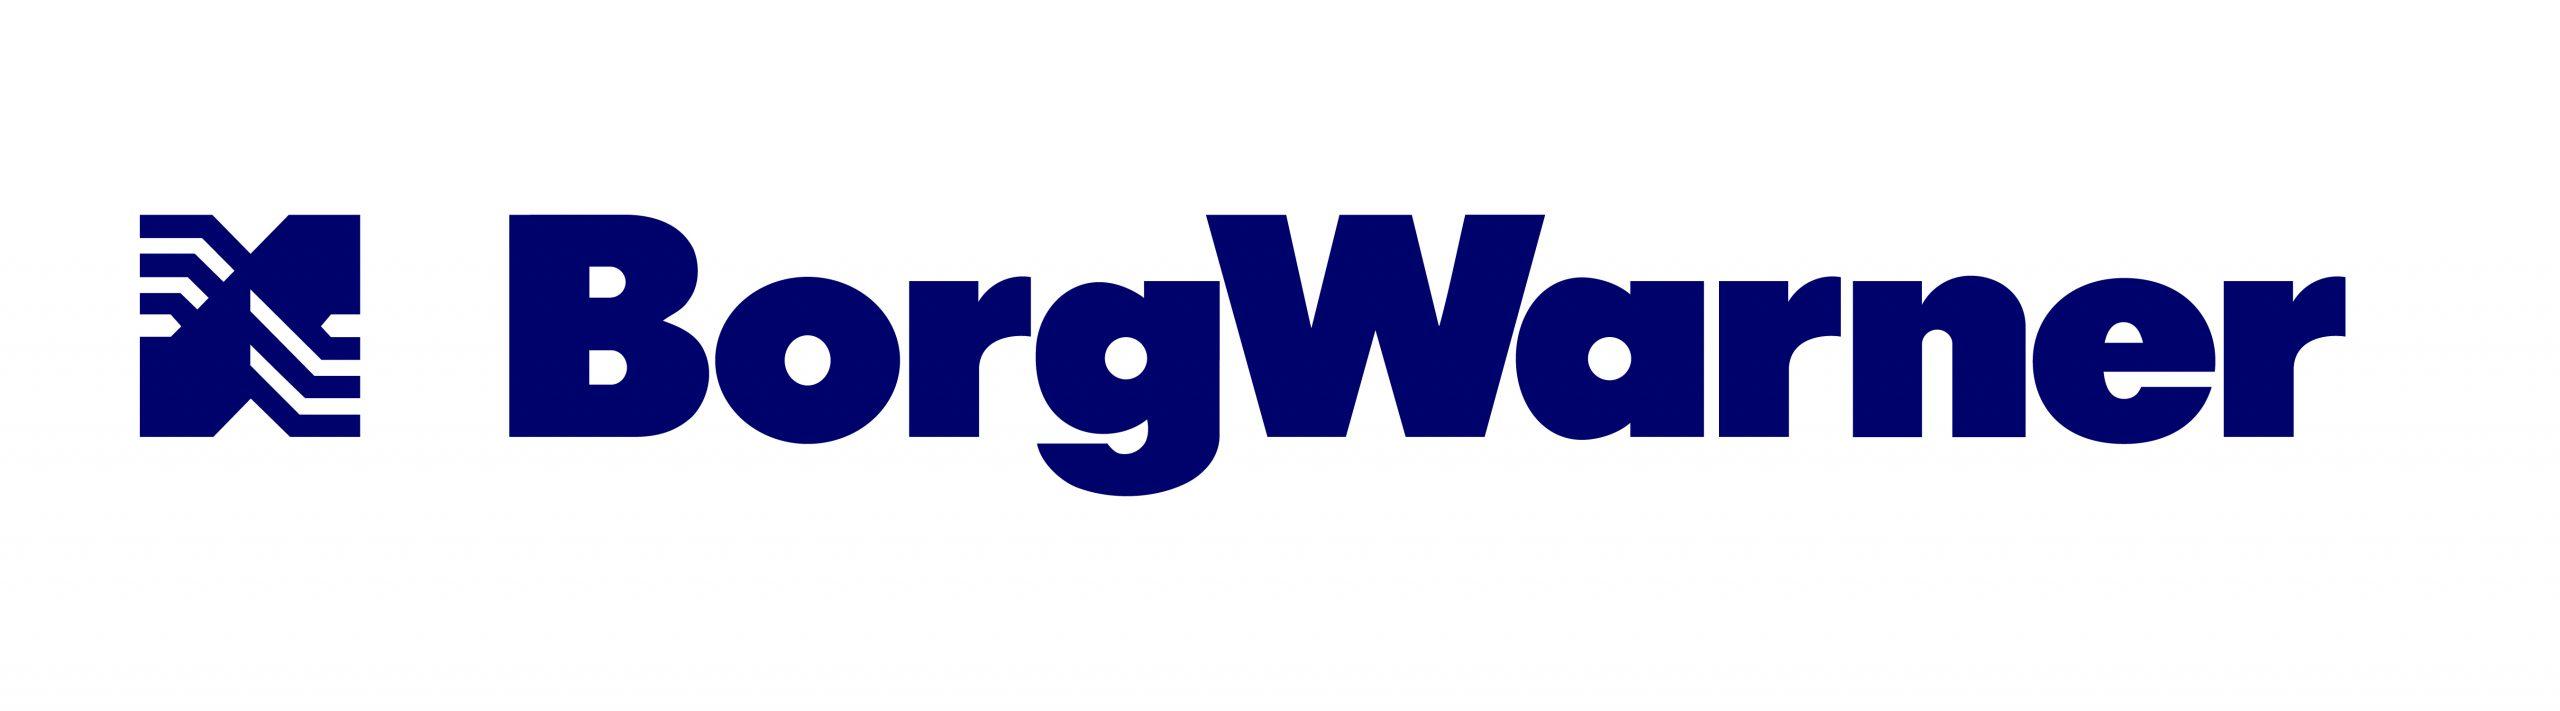 BorgWarner_Logo_Blue.jpg